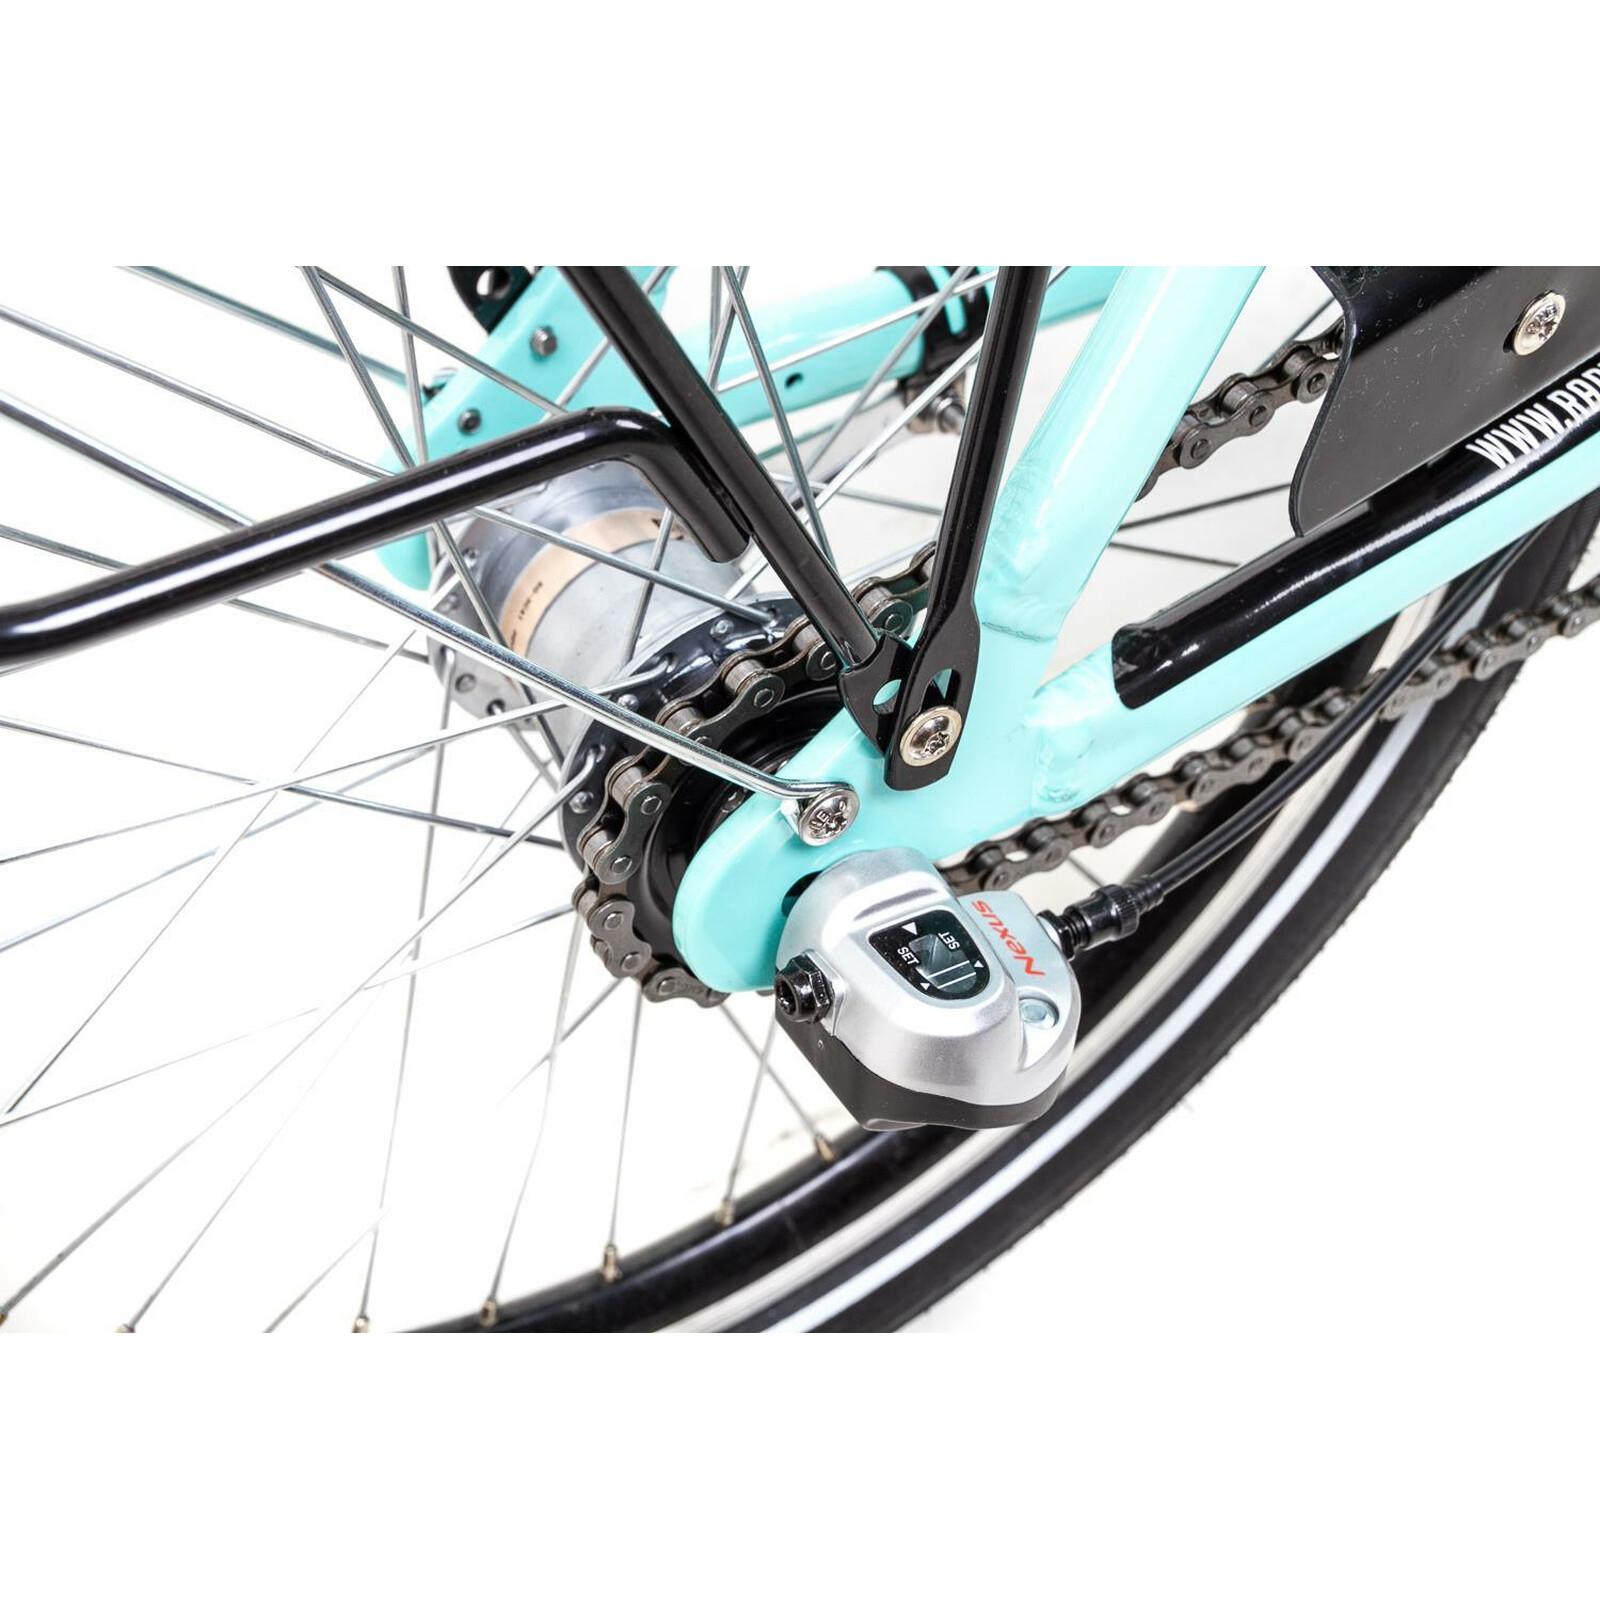 20 Zoll Alu Klapp Fahrrad Faltrad Shimano 3 Gang Nabendynamo Schwalbe Ballon Reifen Mint